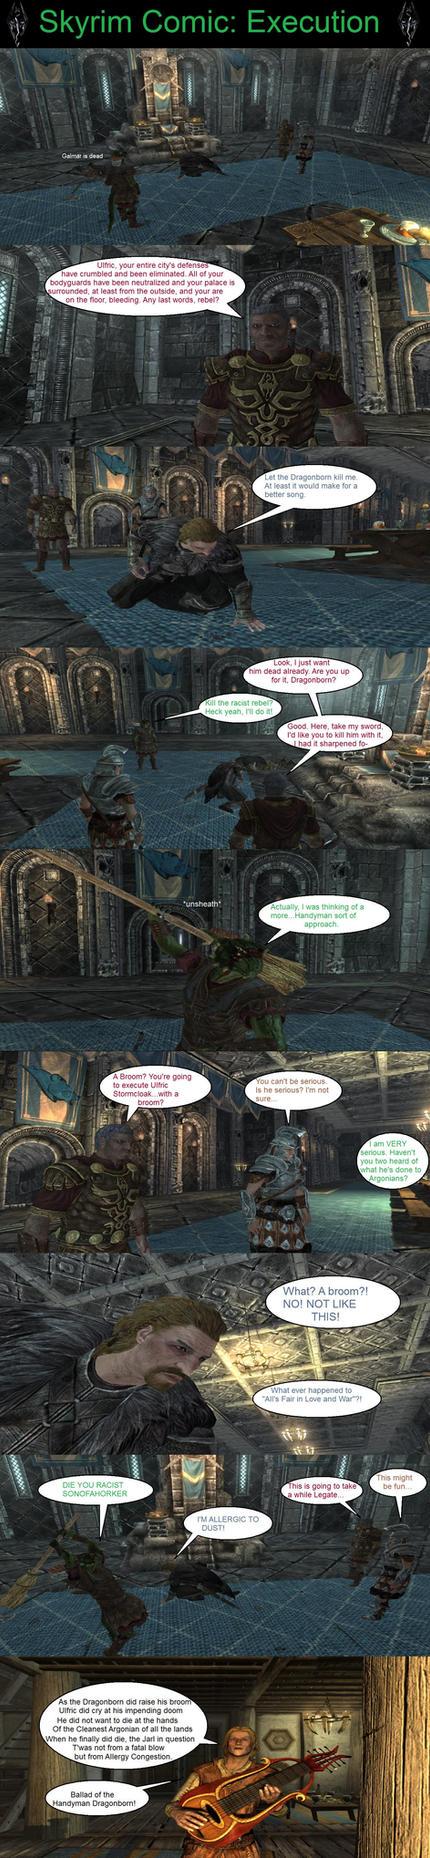 Skyrim is Strange - Execution by HelloMyNameIsEd